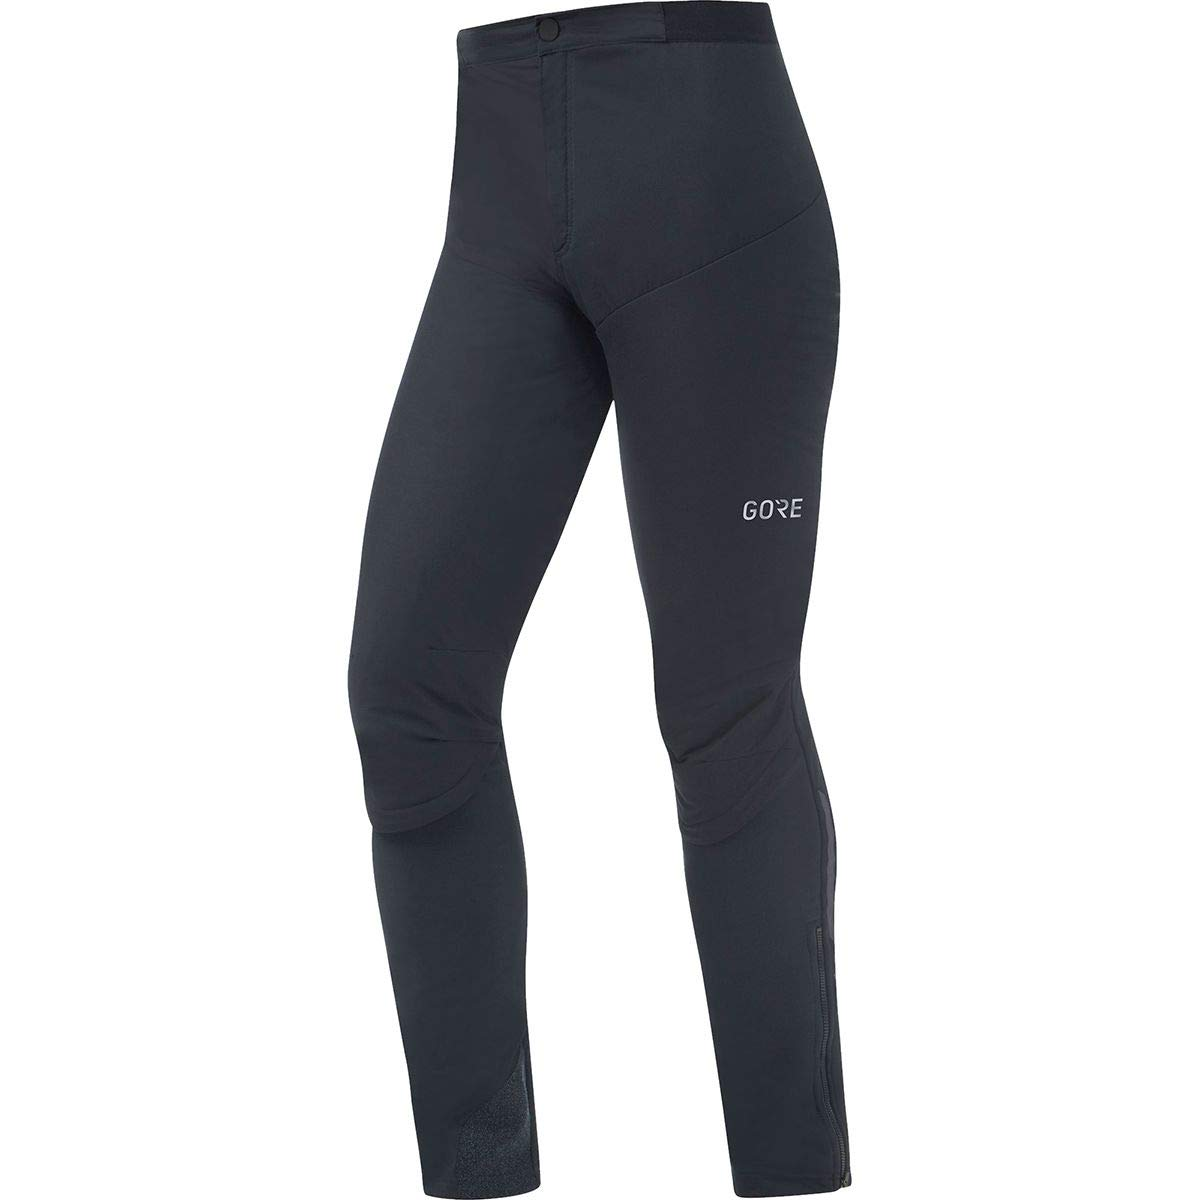 GORE WEAR Windproof Men's Long Cycling Pants, C7 Gore Windstopper Insulated Pants, S, Black, 100357